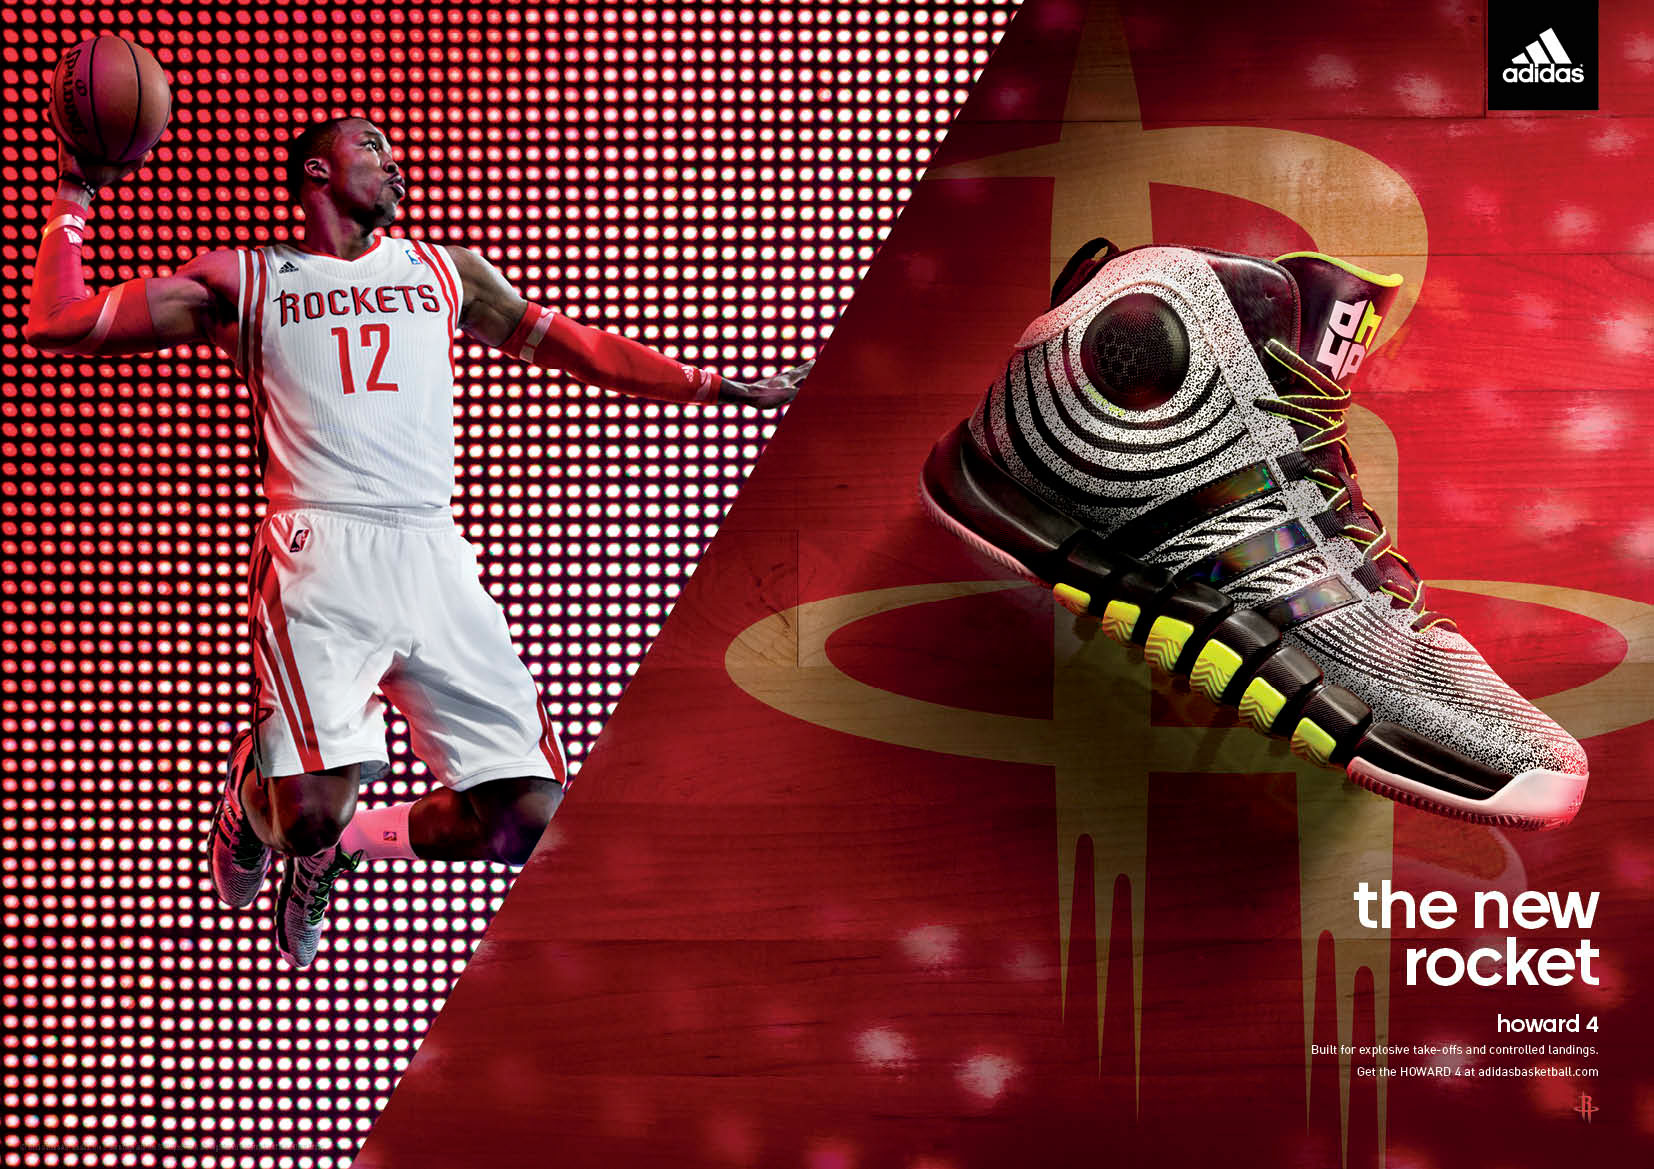 9d2978eb49fb adidas Dwight Howard 4 shoe campaign. Conceptualized